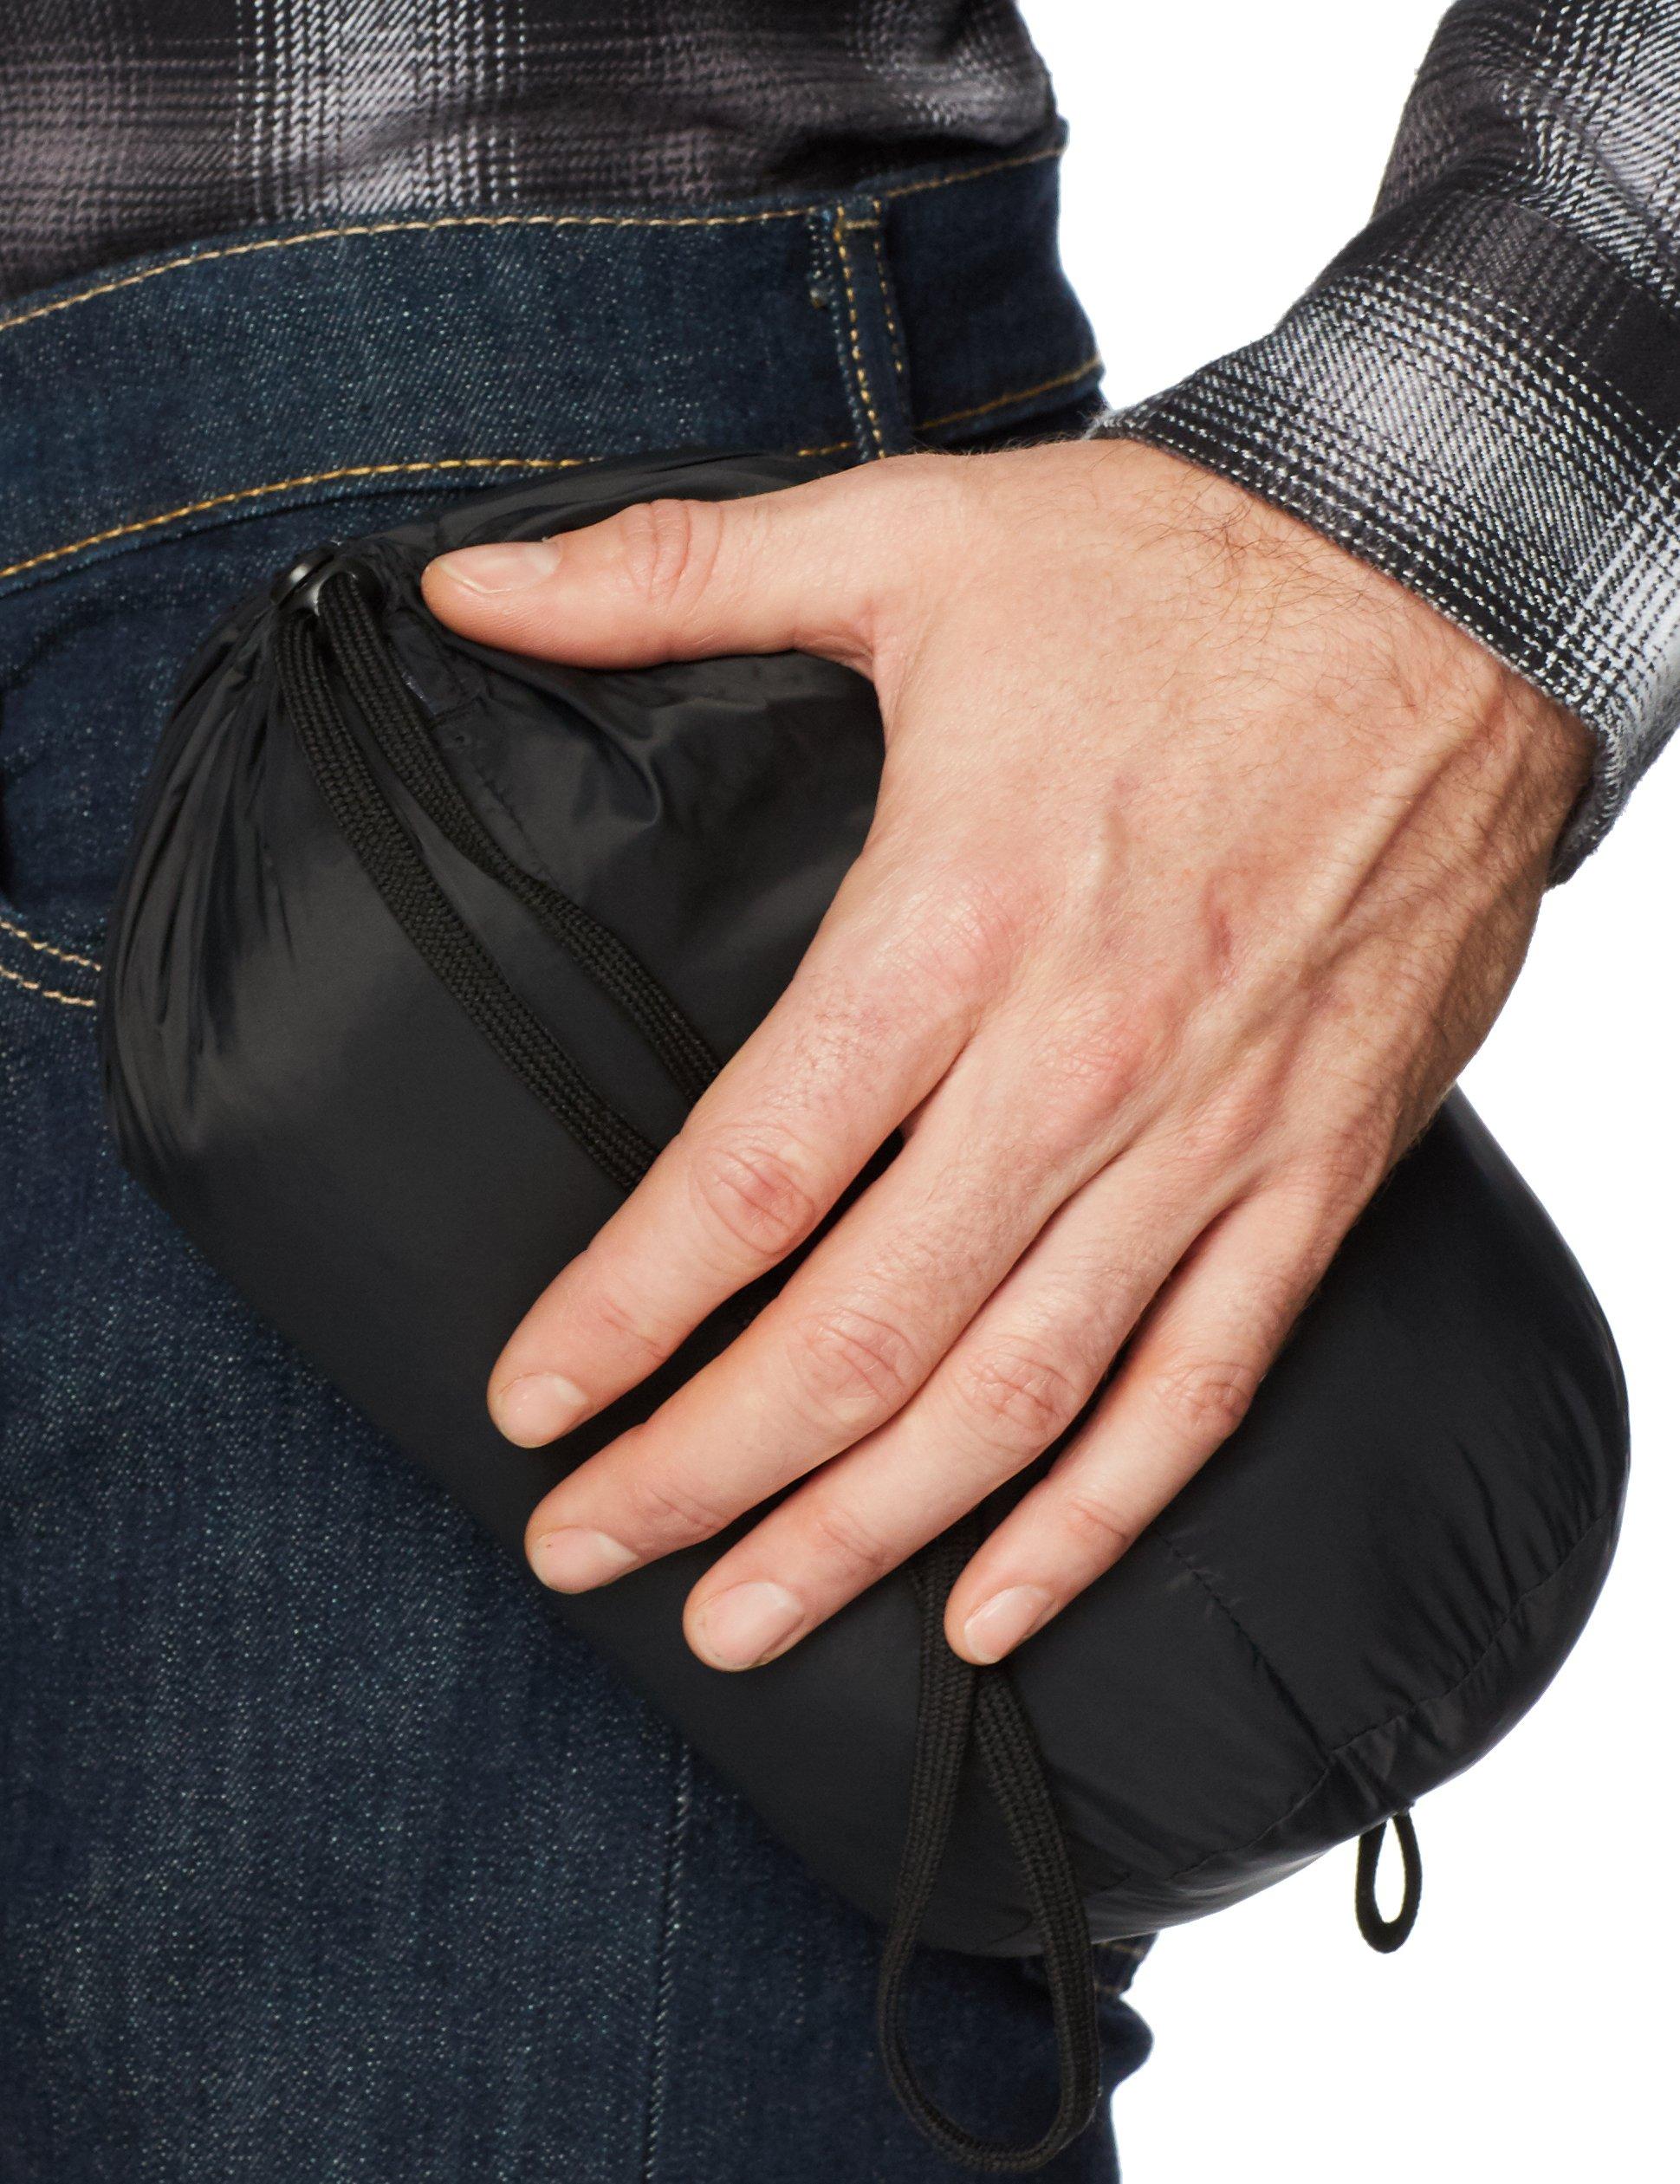 Amazon Essentials Men's Lightweight Water-Resistant Packable Down Jacket, Black, Large by Amazon Essentials (Image #5)